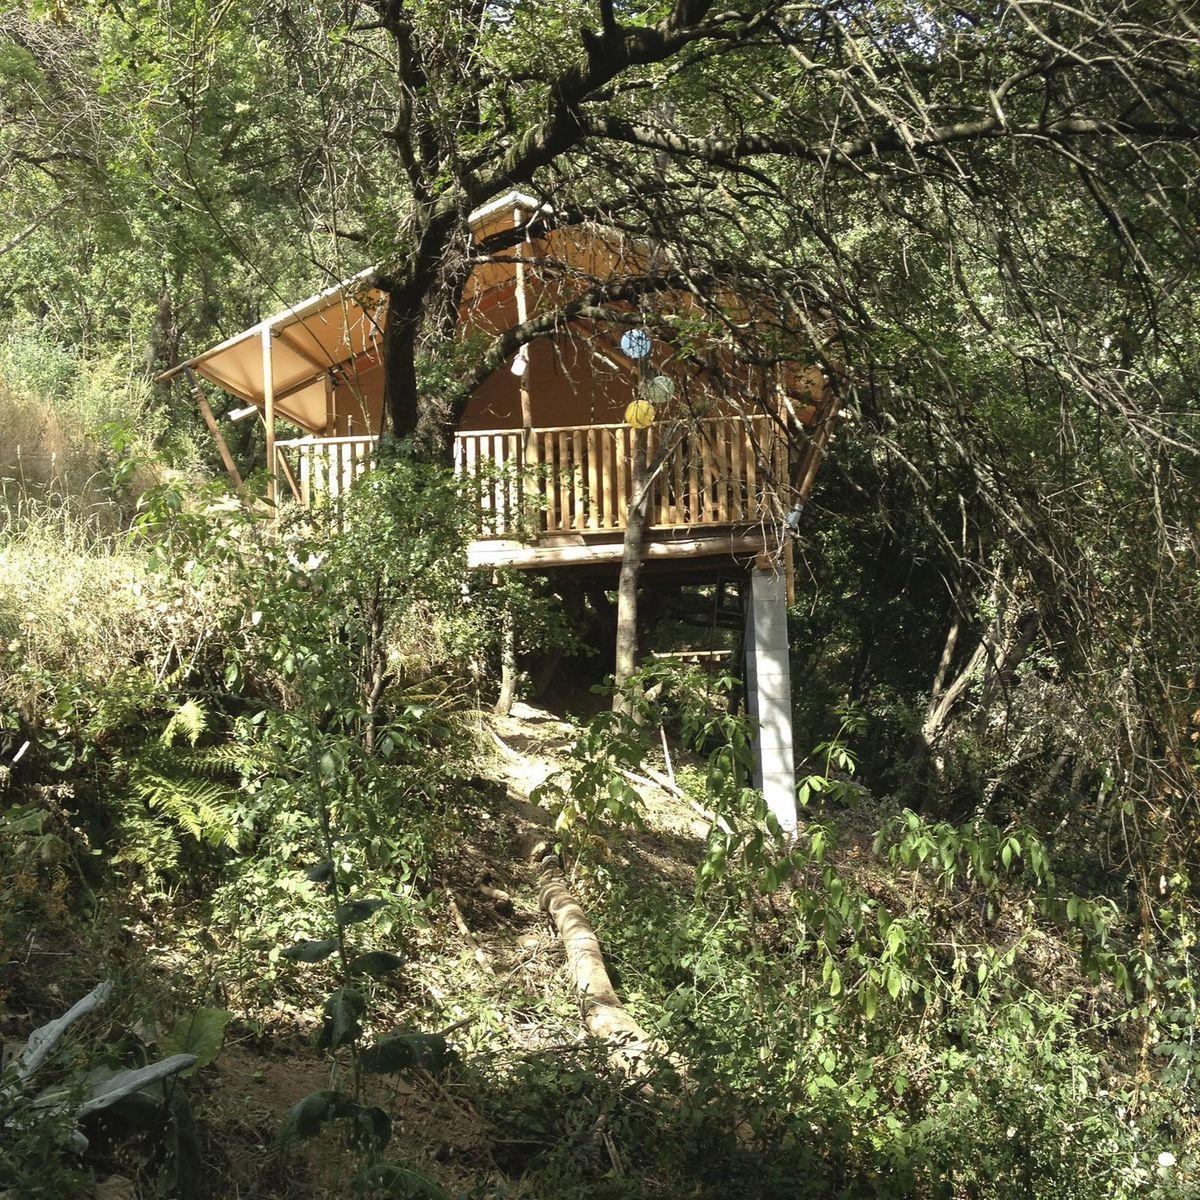 Cevenolse Mas Safaritent - kampeervakantie in Franse natuur